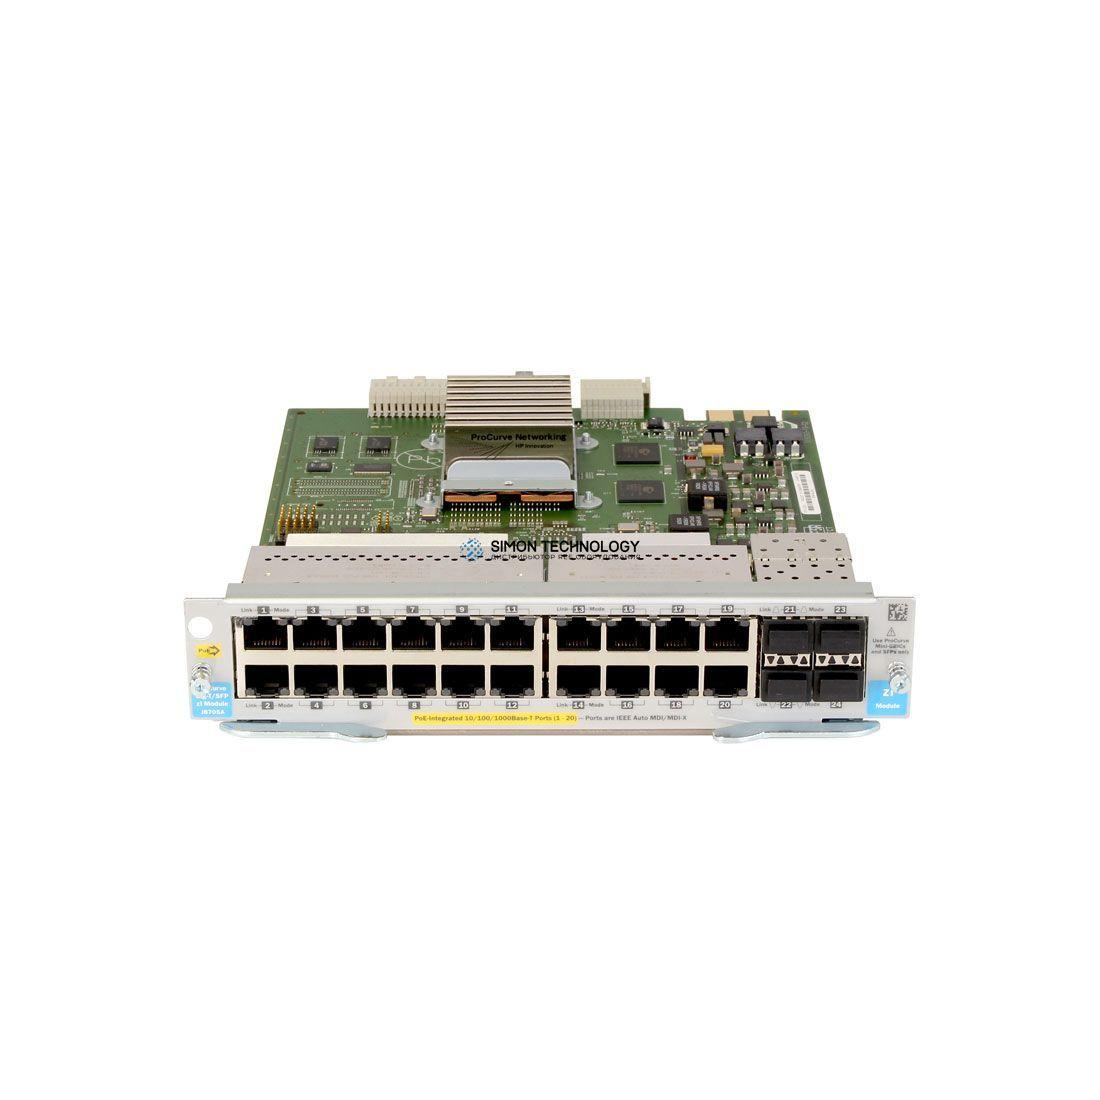 Модуль HPE HPE 20p 10/100/1000 PoE+/4p MGBIC zl Mod (J9308-61201)